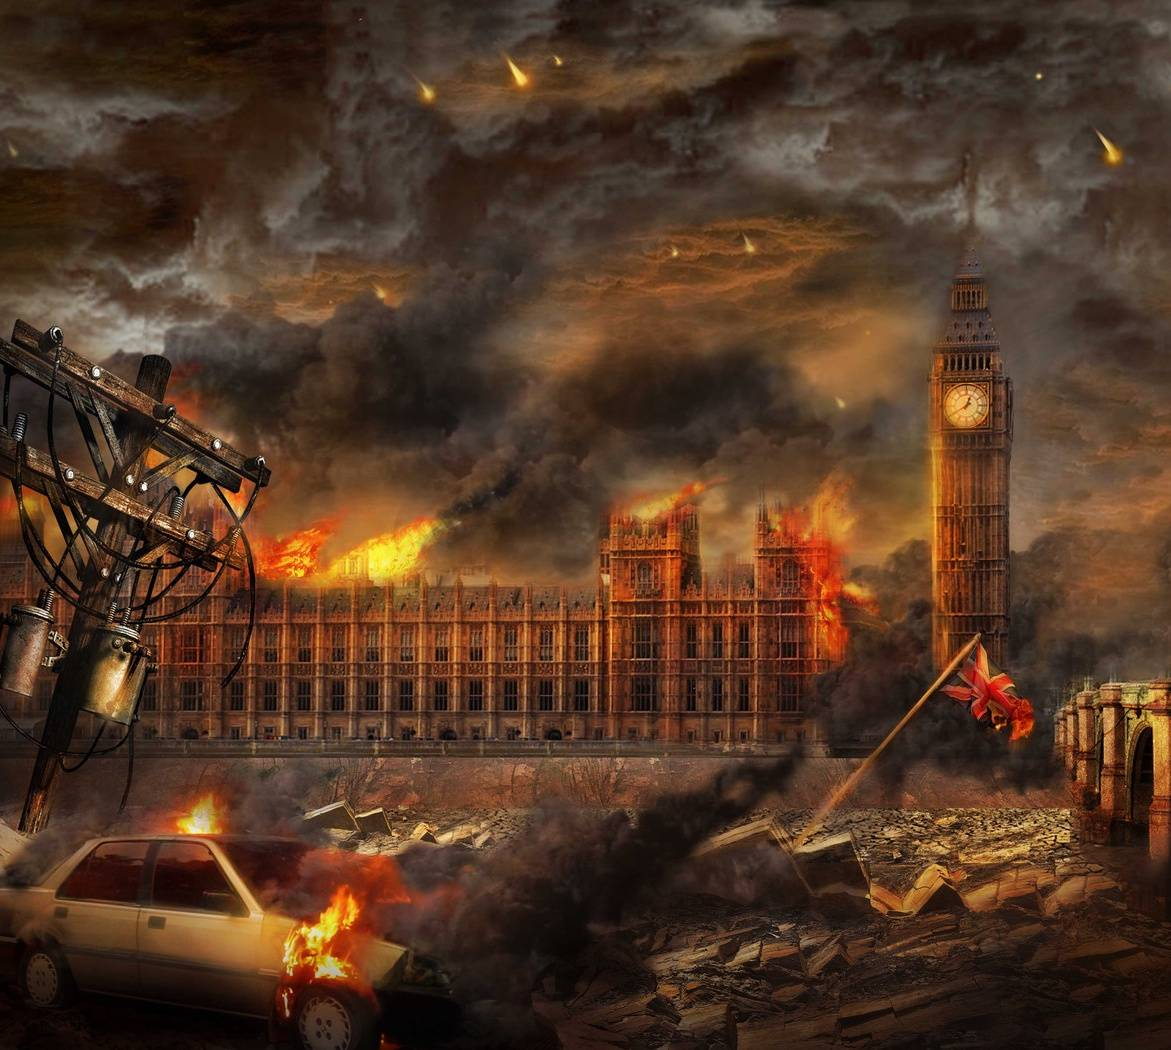 Burning City wallpaper by Sam_ardya - 13 - Free on ZEDGE™